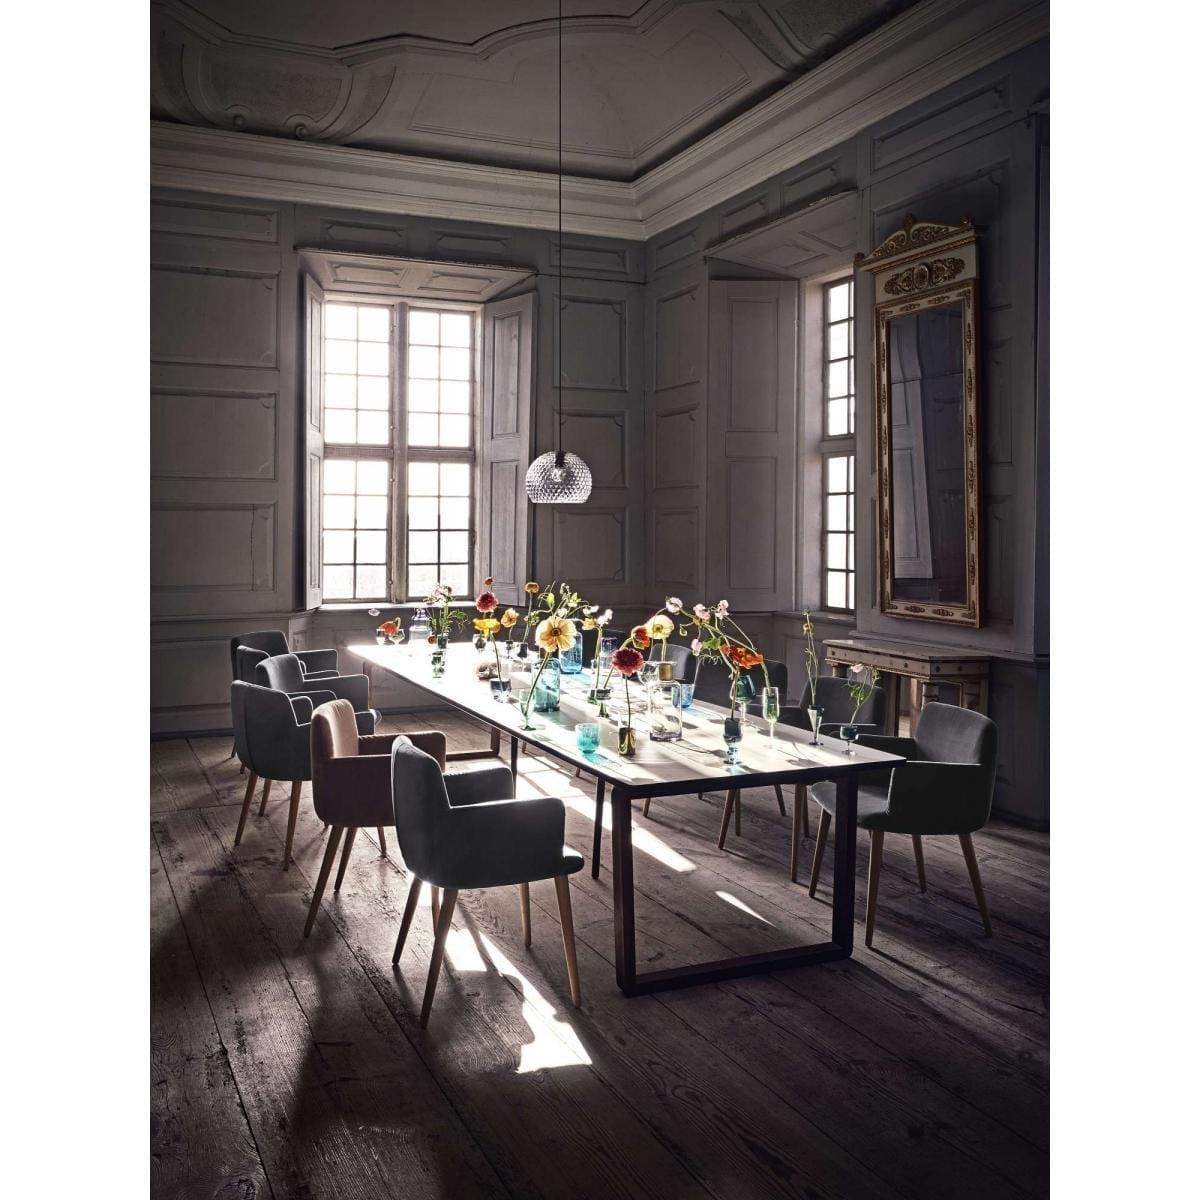 bolia_c3_dining_chair_innoconcept_etkezoszek_4